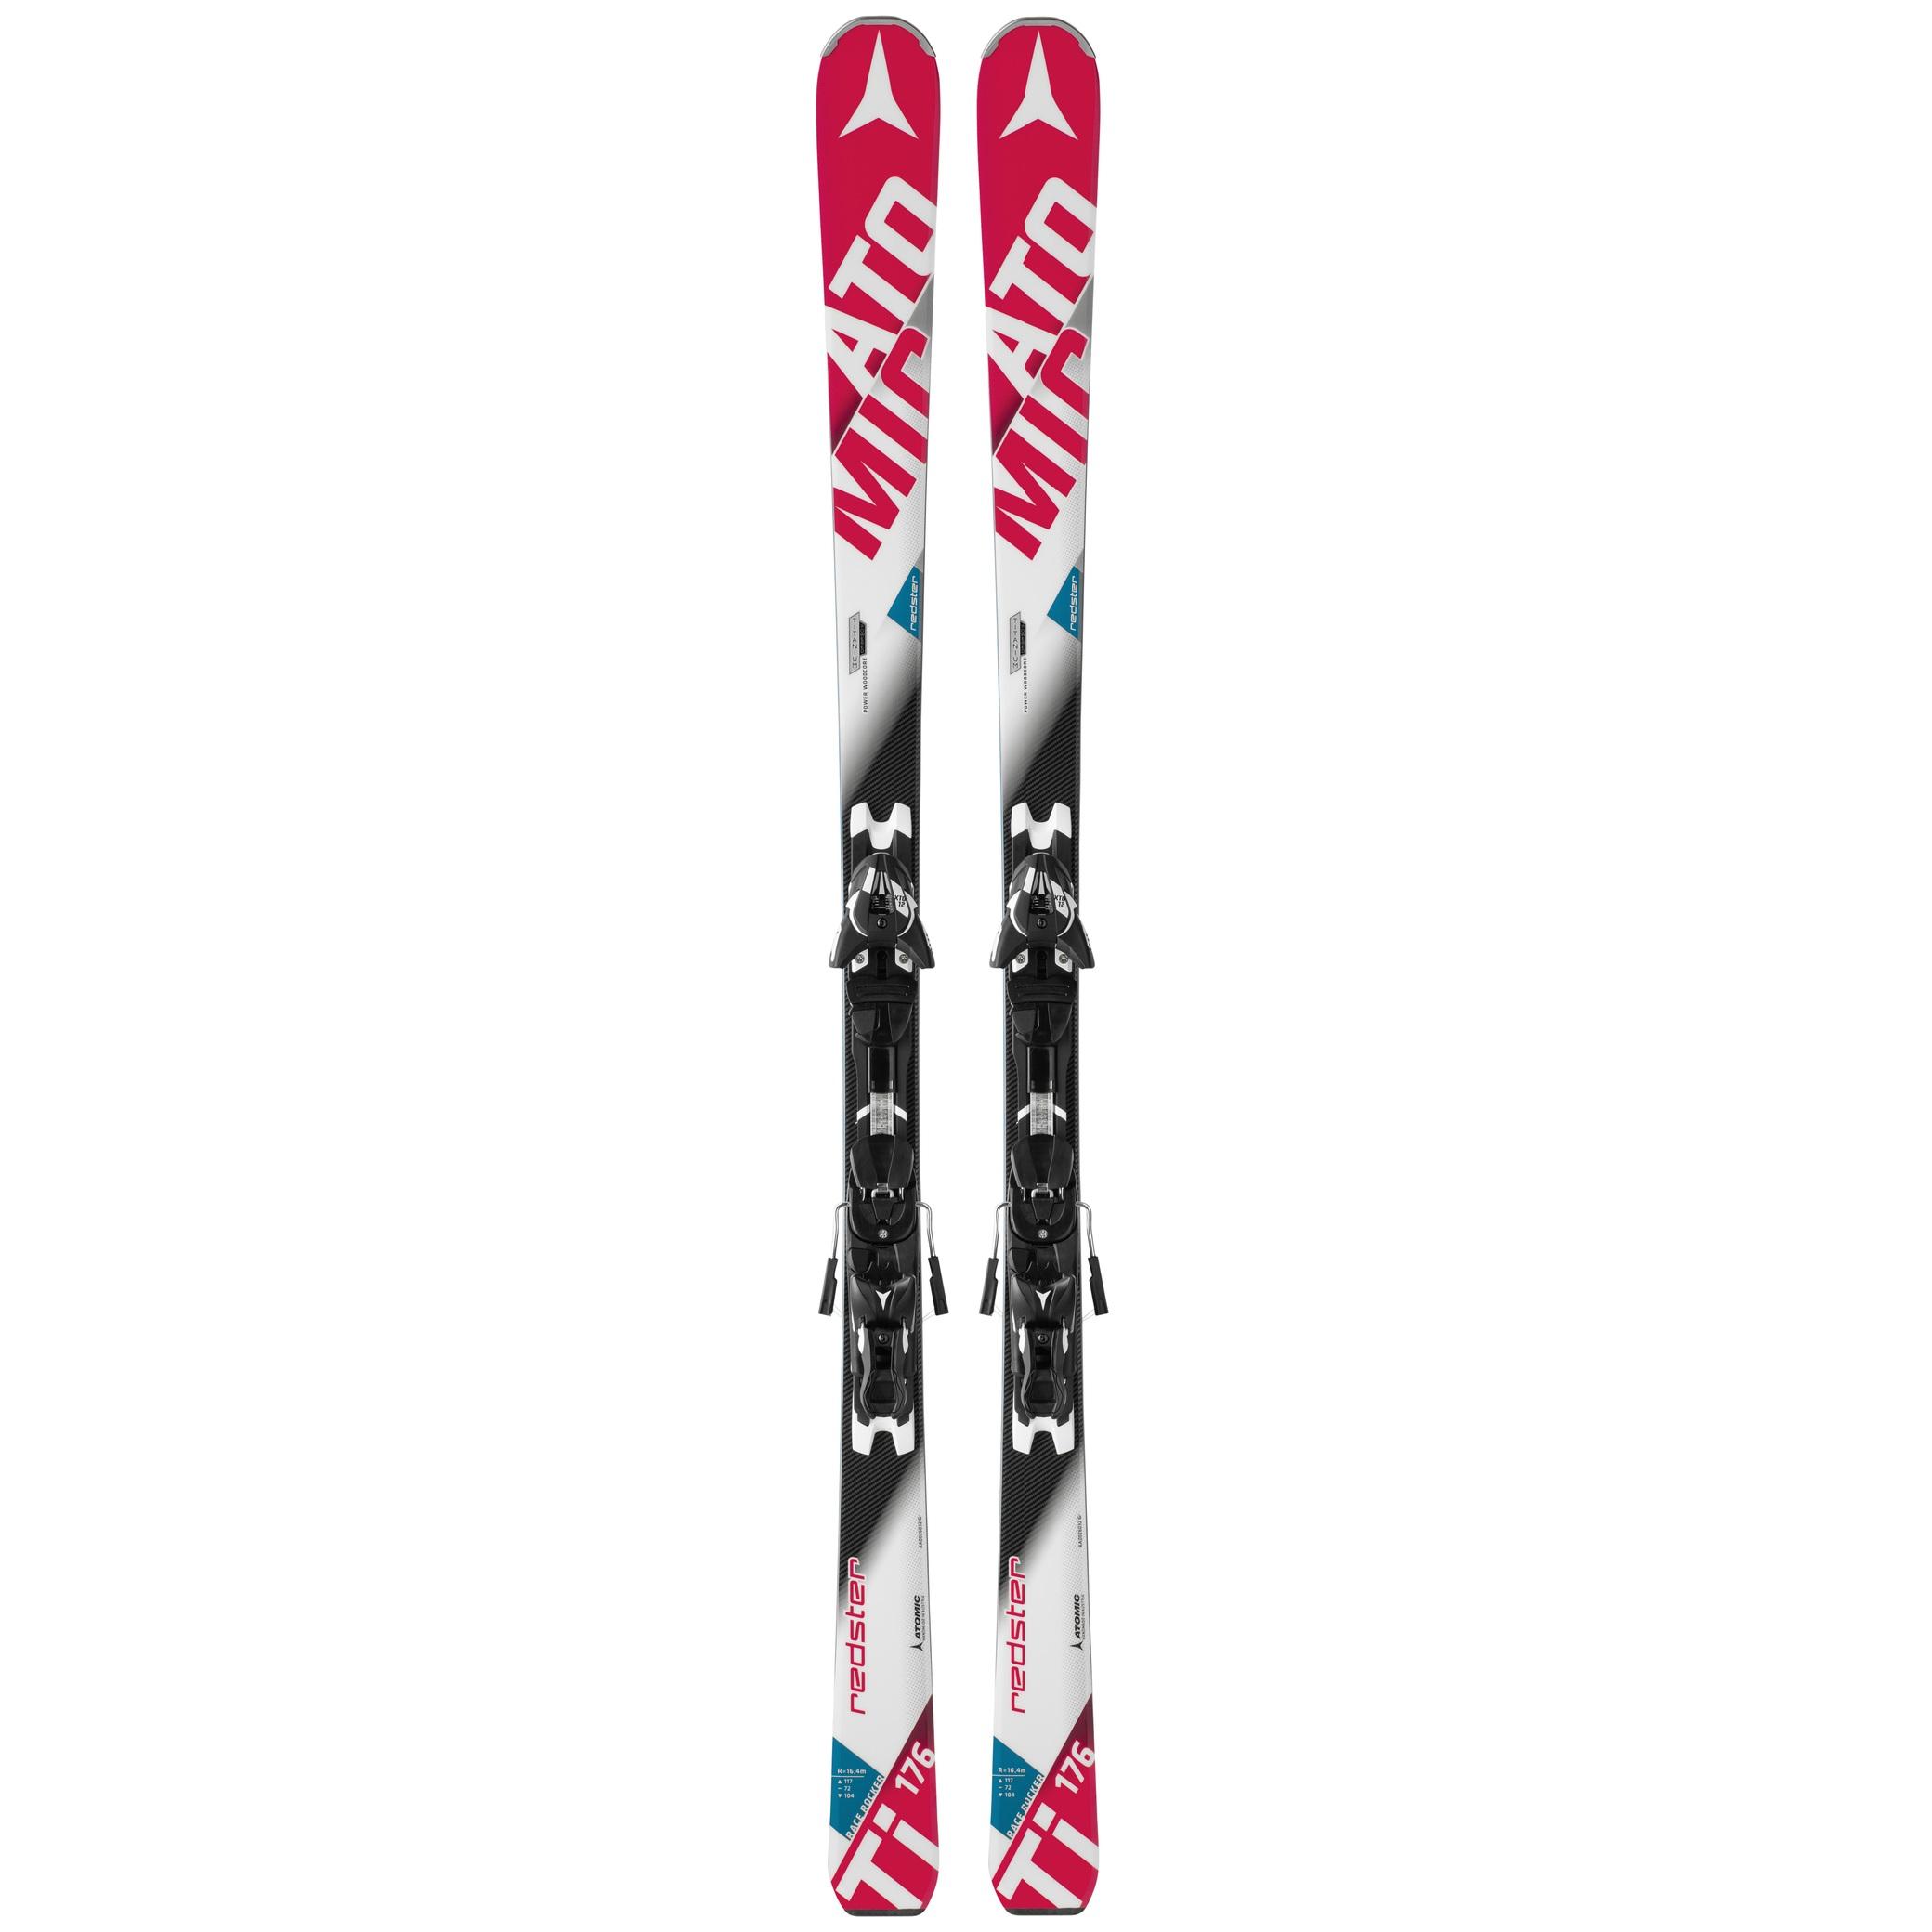 Ski | Atomic Redster TI + XTO 12 | Ski